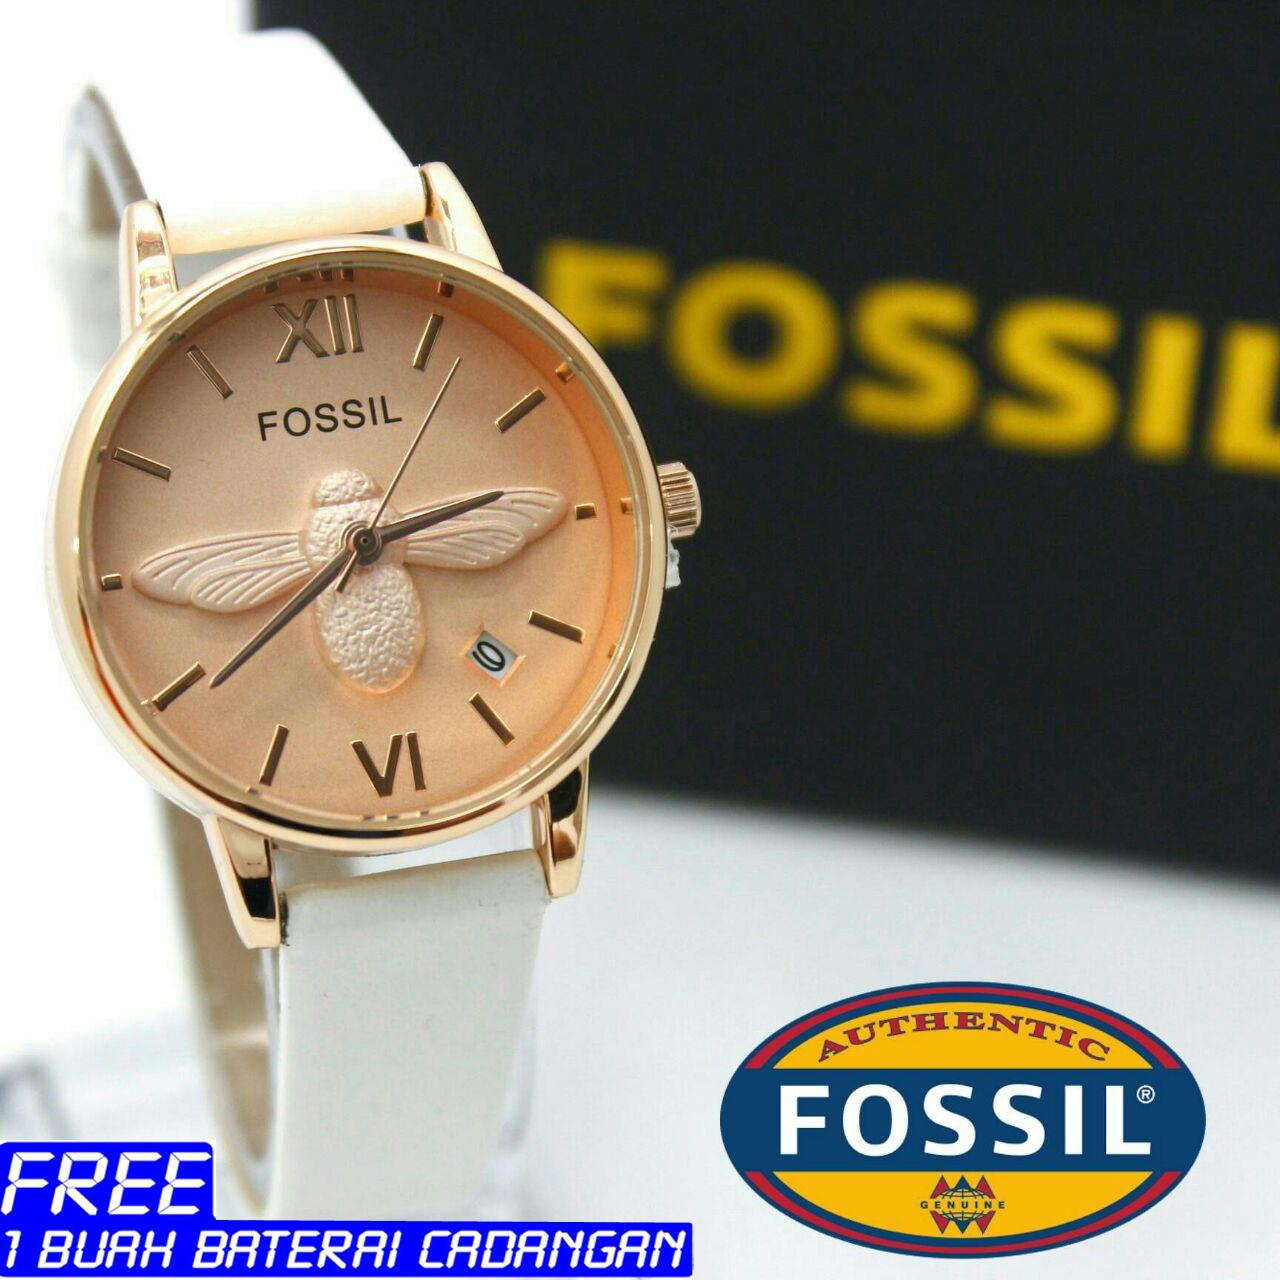 Fossil Am4522 Cecile Multifunction Jam Tangan Wanita Black Am4632 Original Karet Analog Time Model Kumbang